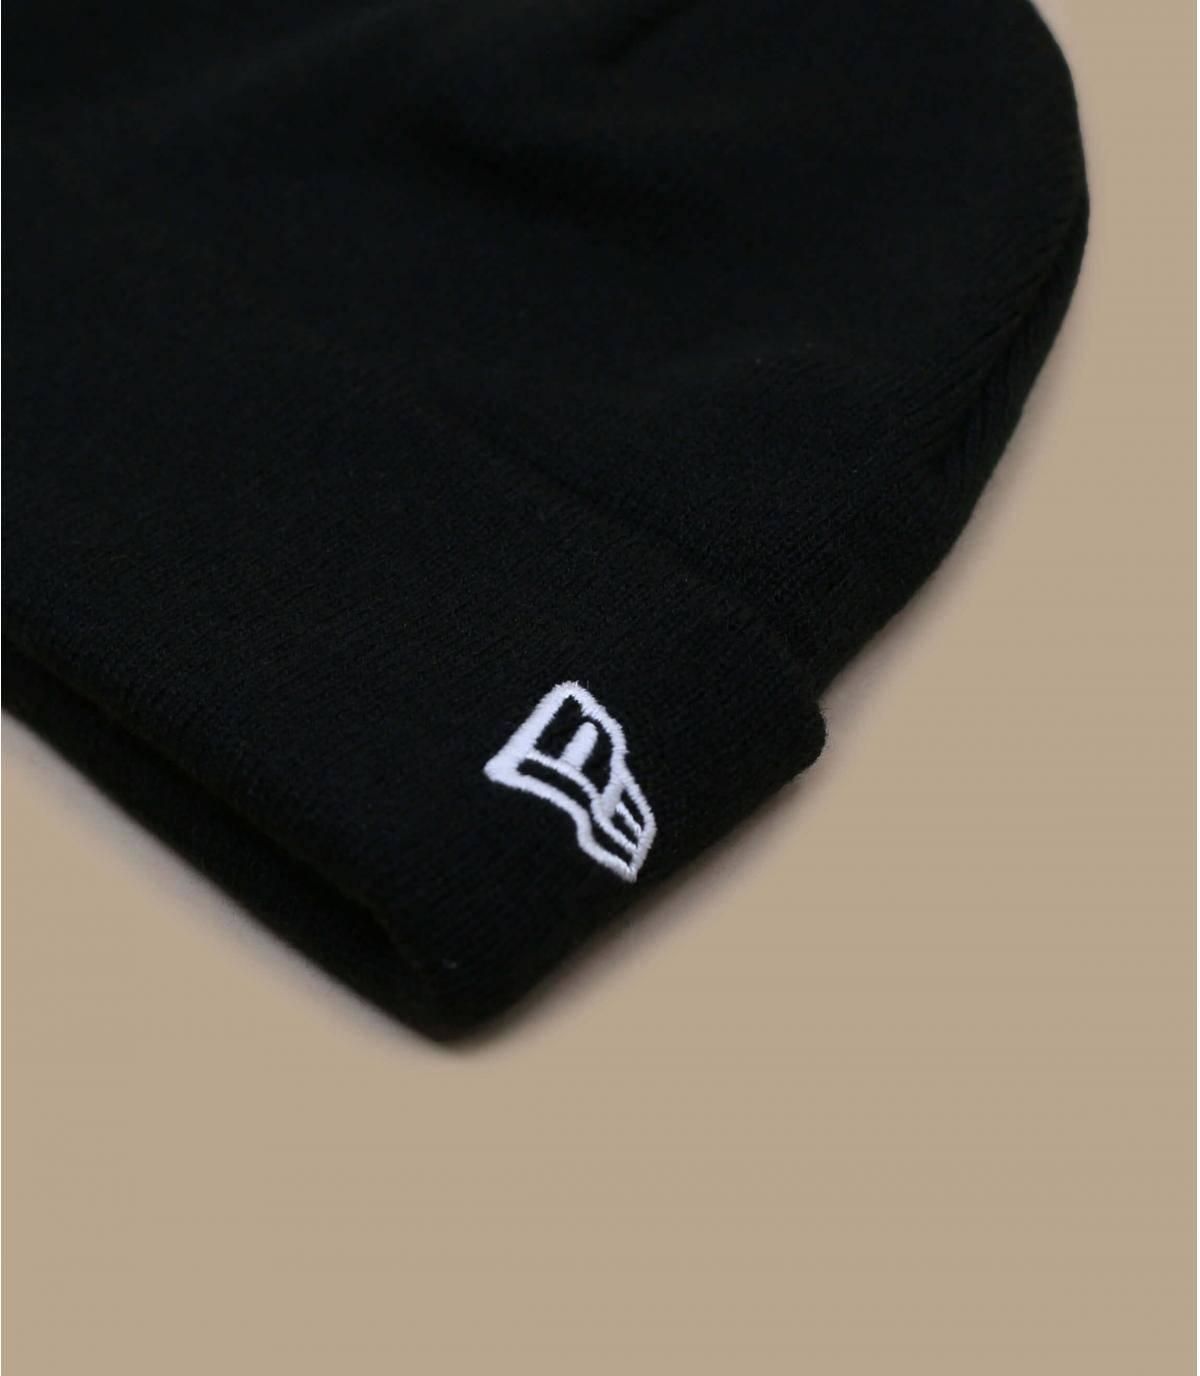 Detalles Pop Short Cuff black imagen 3